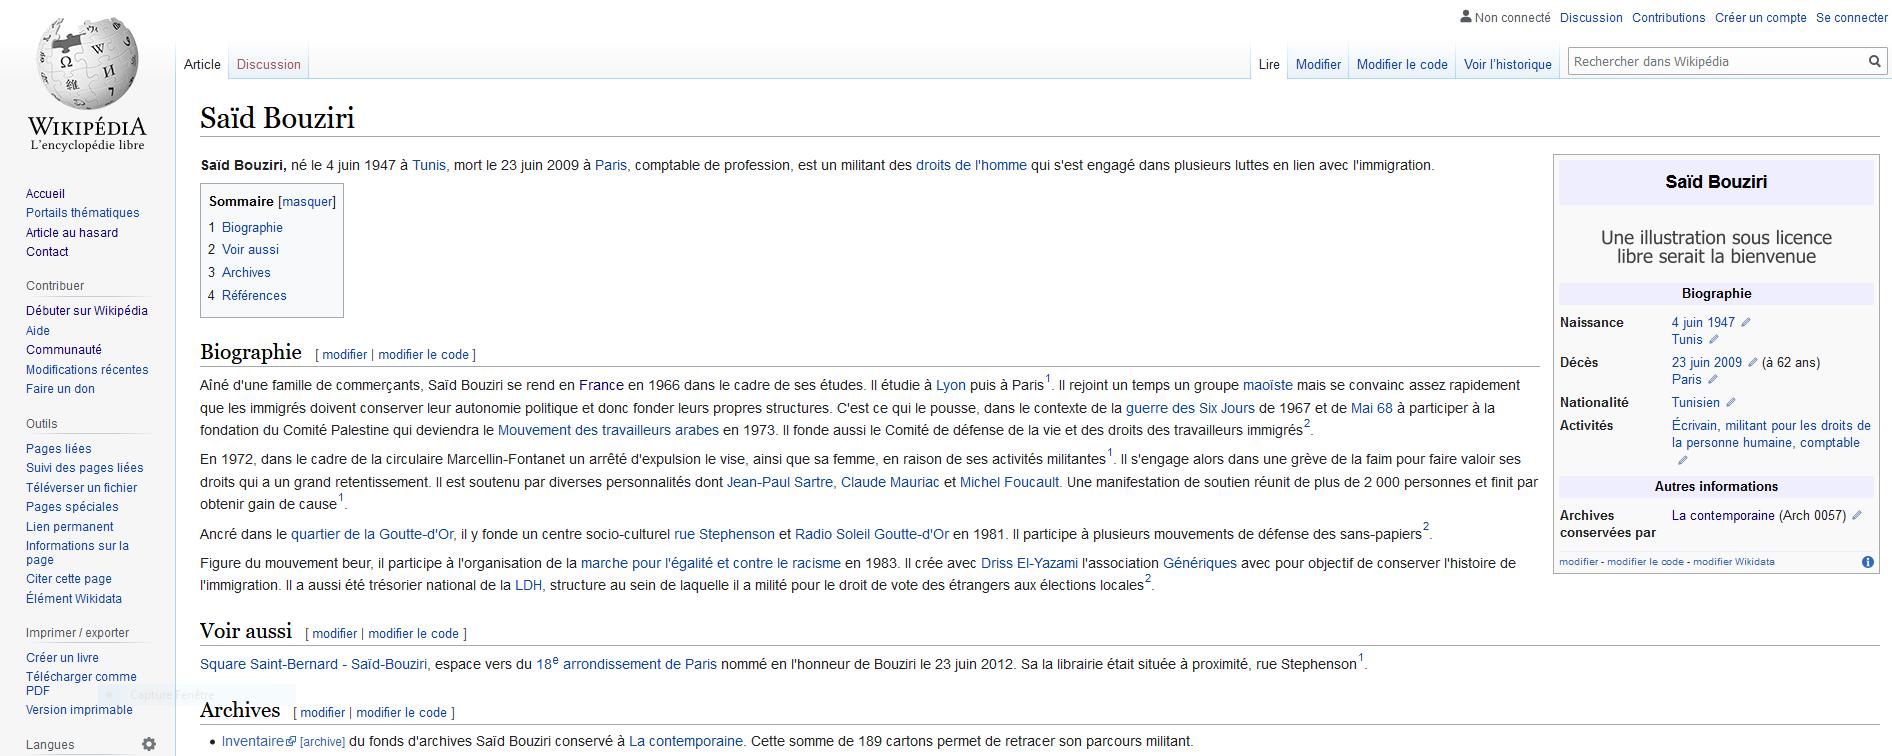 Capture article Wikipédia de Saïd Bouziri